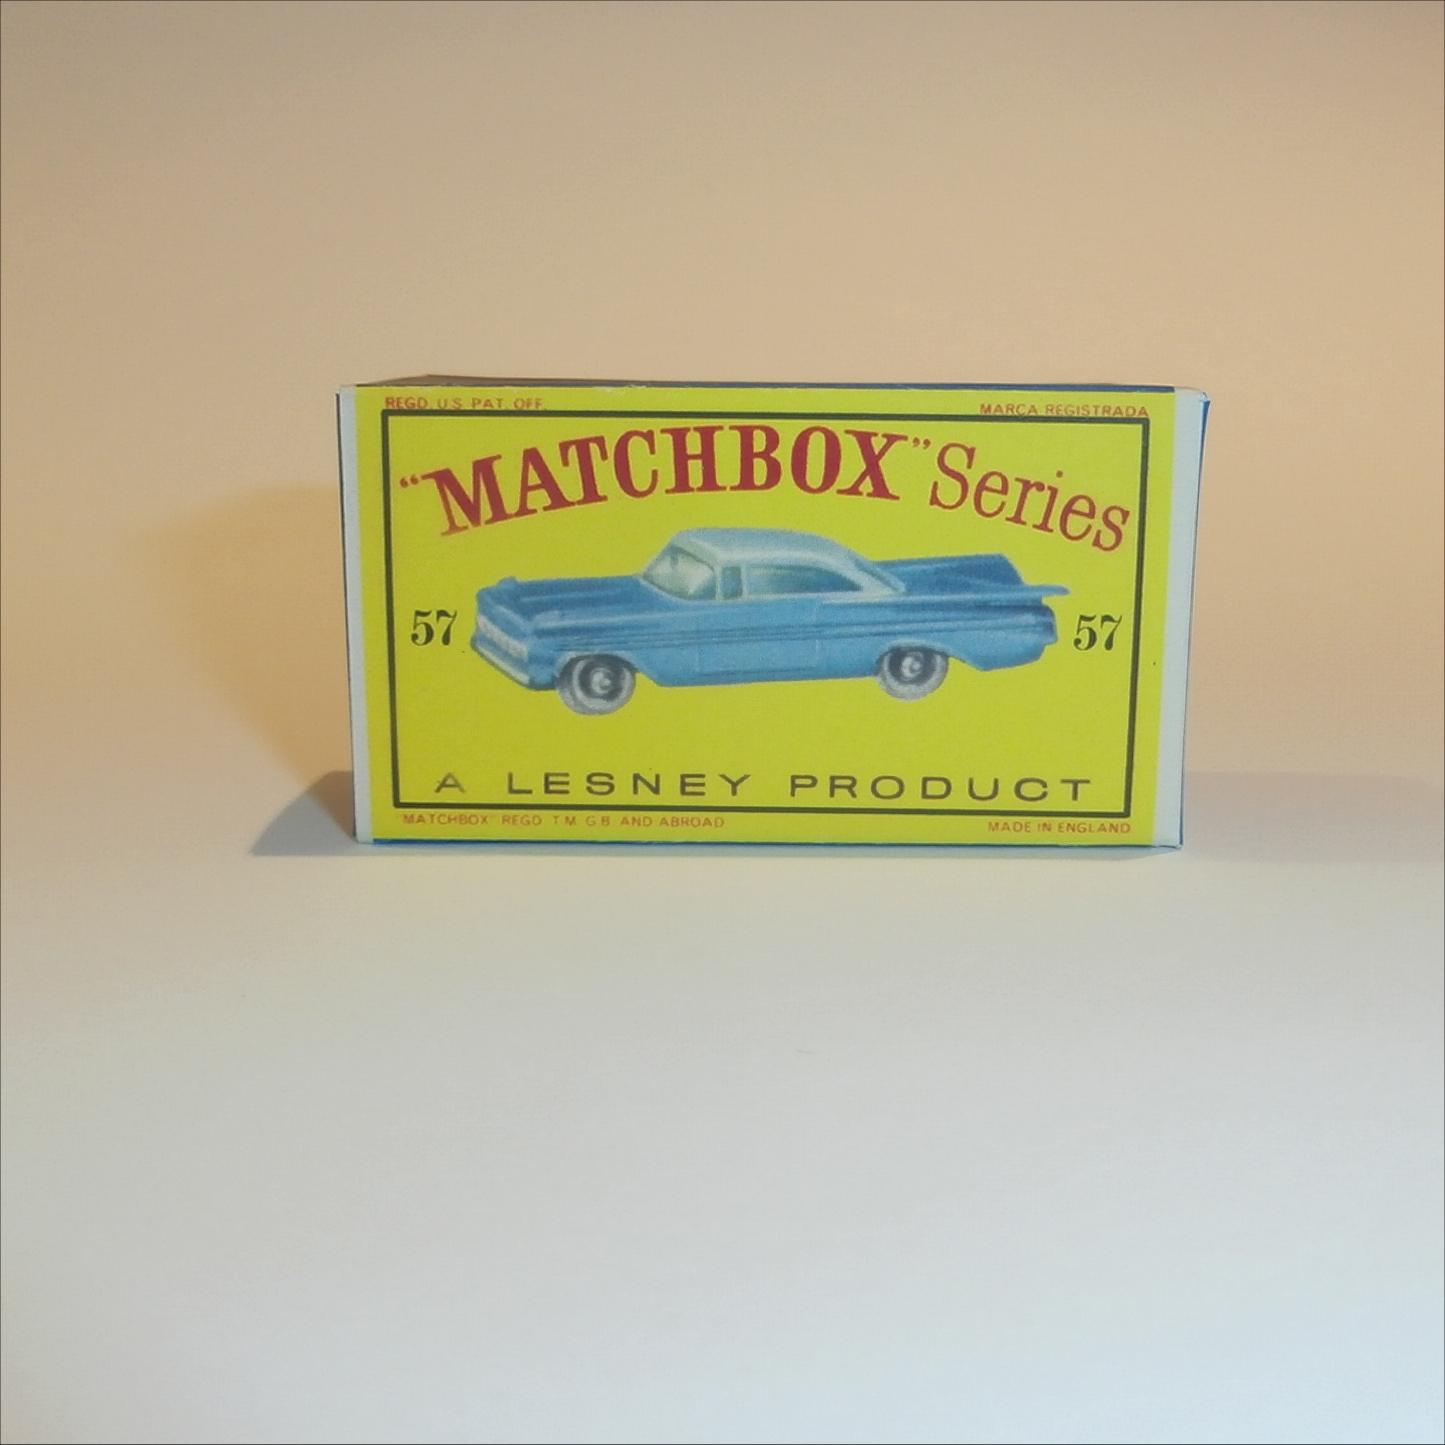 REPRO BOX MATCHBOX SUPERFAST n 4 57 Chevy